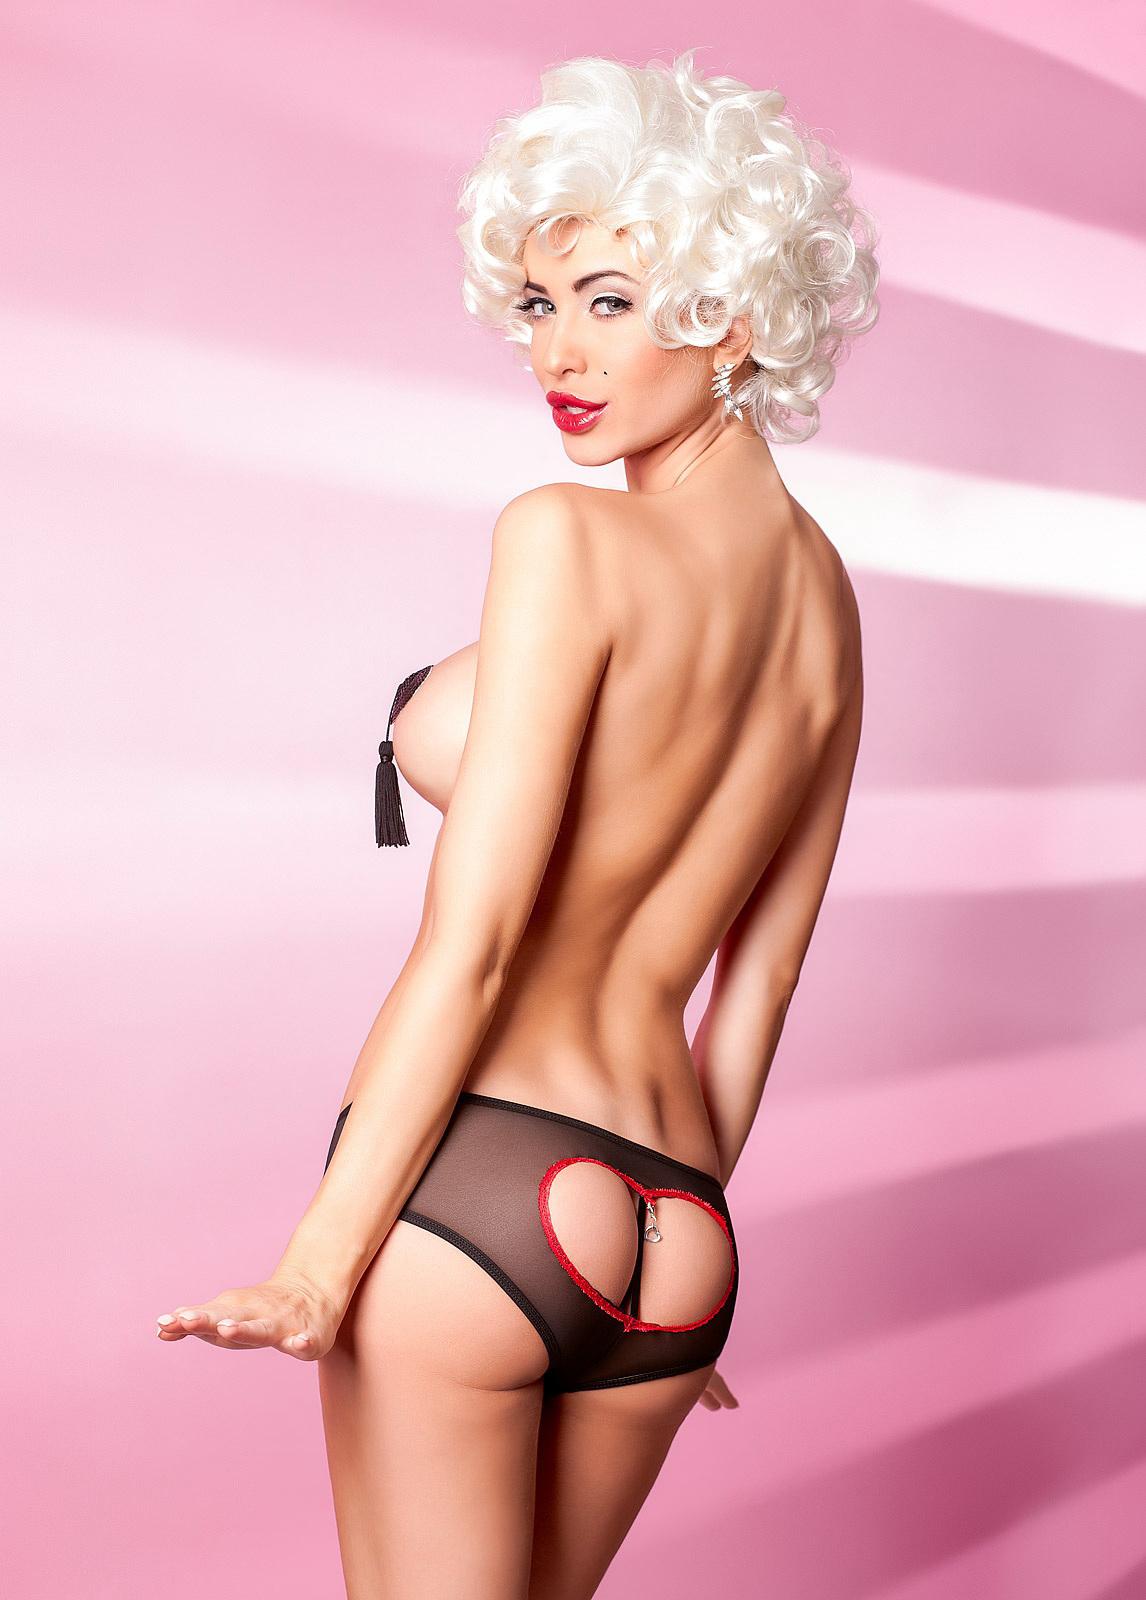 hot women's back - Monika Pietrasinska